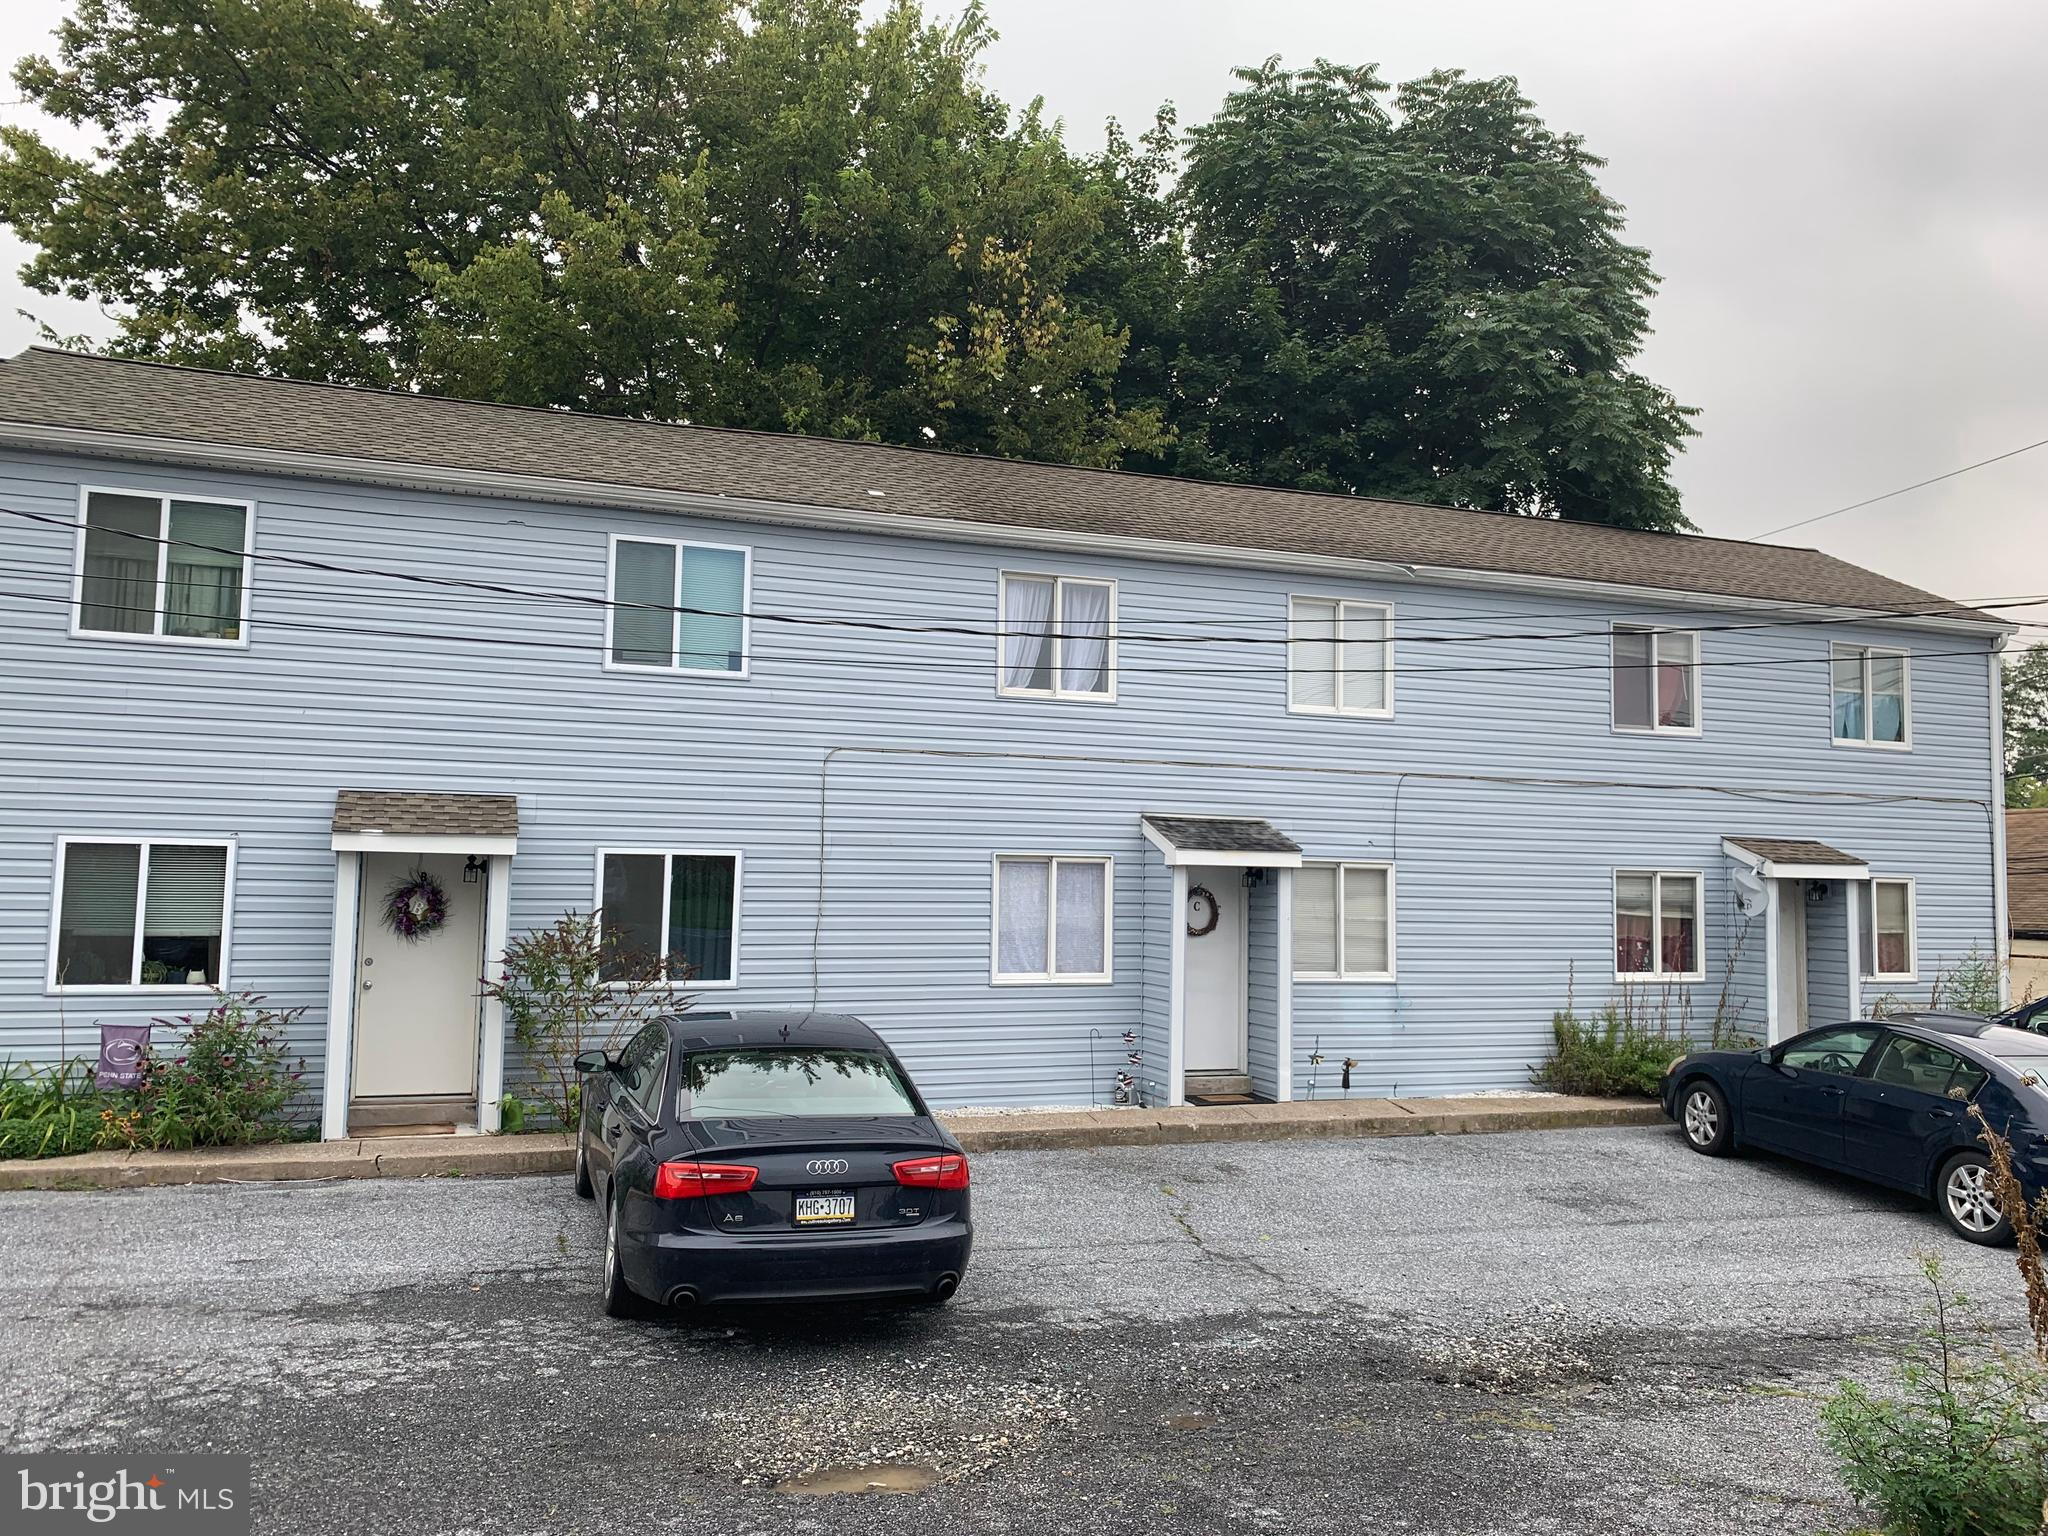 426 MARKET STREET, LEMOYNE, PA 17043